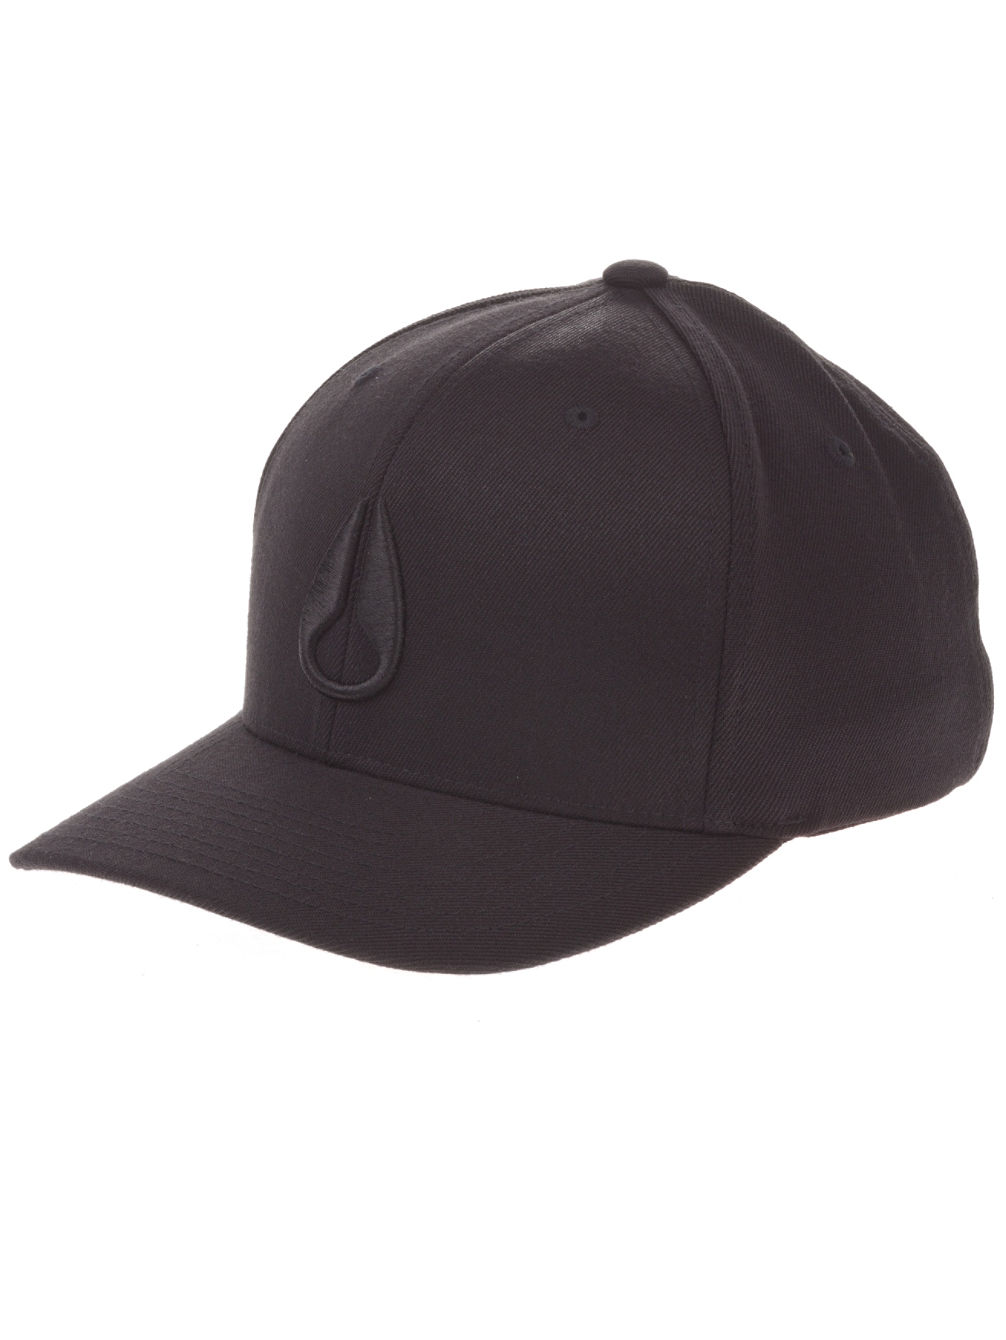 7441a9a2d6120 Buy Nixon Deep Down Flex Fit Athletic Cap online at Blue Tomato